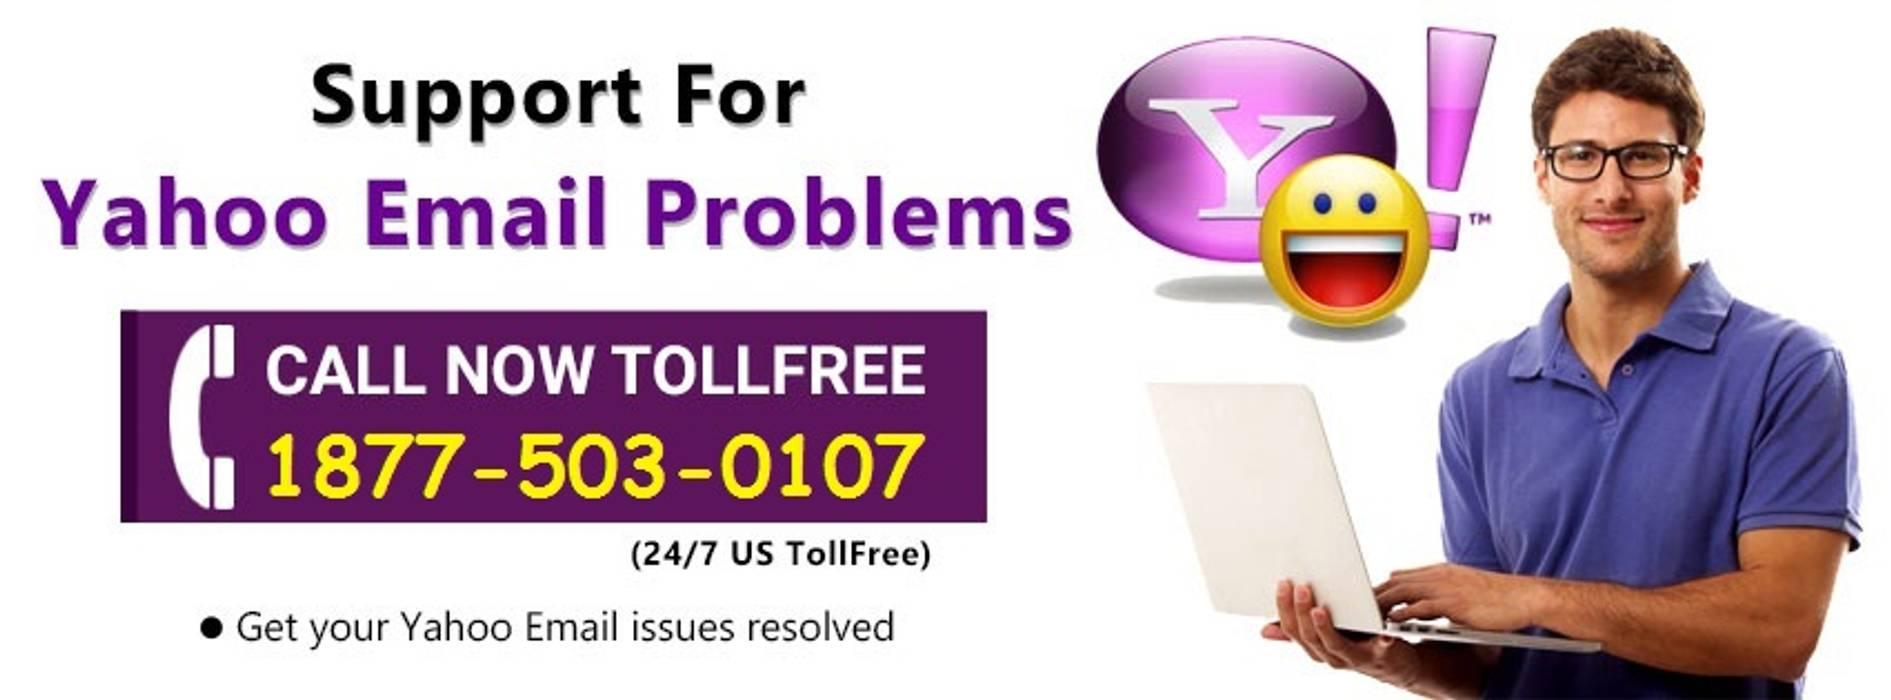 Yahoo Mail Support Number 1877-503-0107 Lantai Kayu Buatan Metallic/Silver